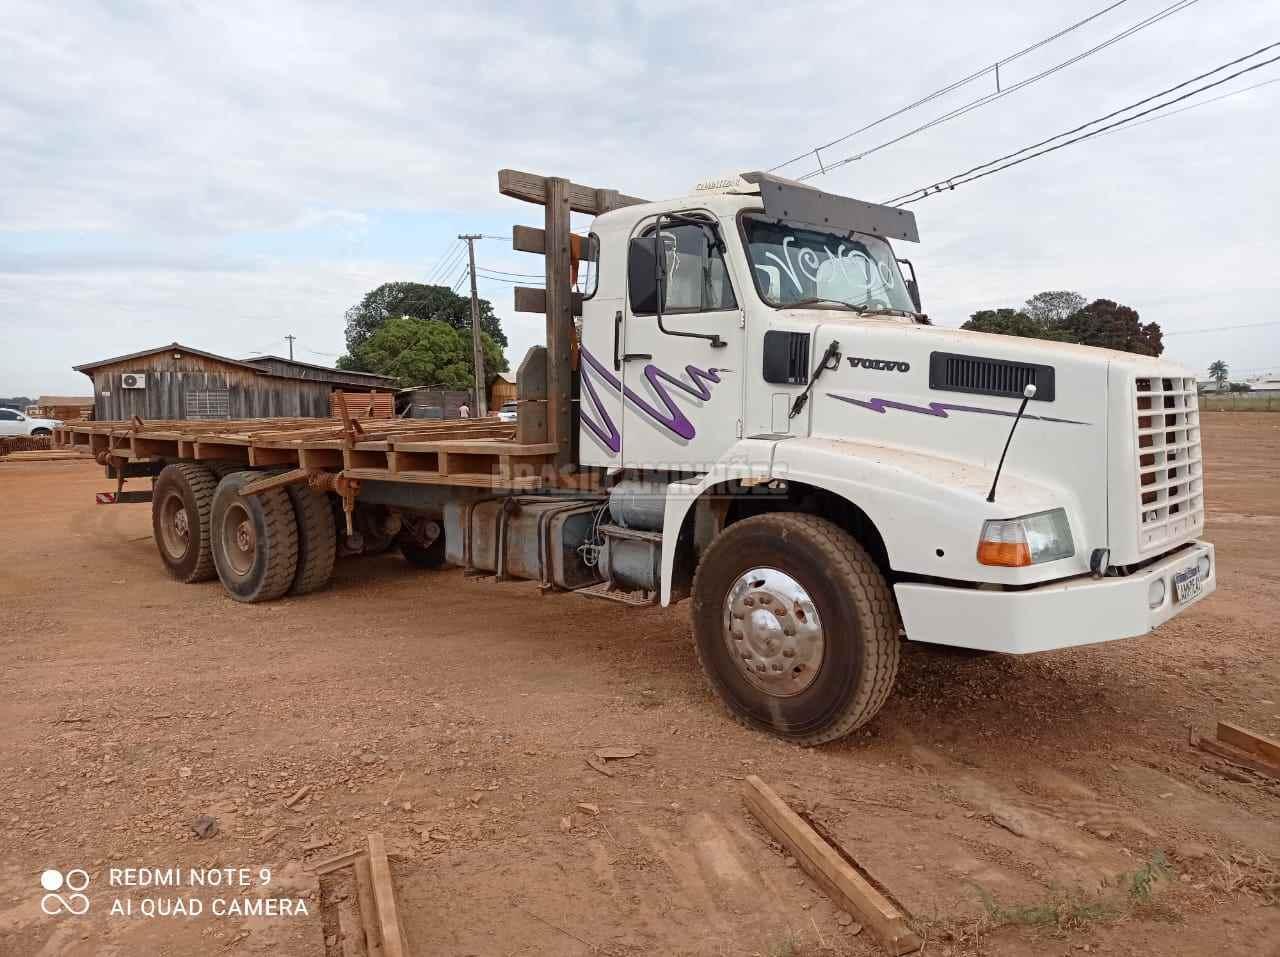 CAMINHAO VOLVO VOLVO NL10 340 Tora Florestal Traçado 6x4 Brasil Caminhões Sinop SINOP MATO GROSSO MT